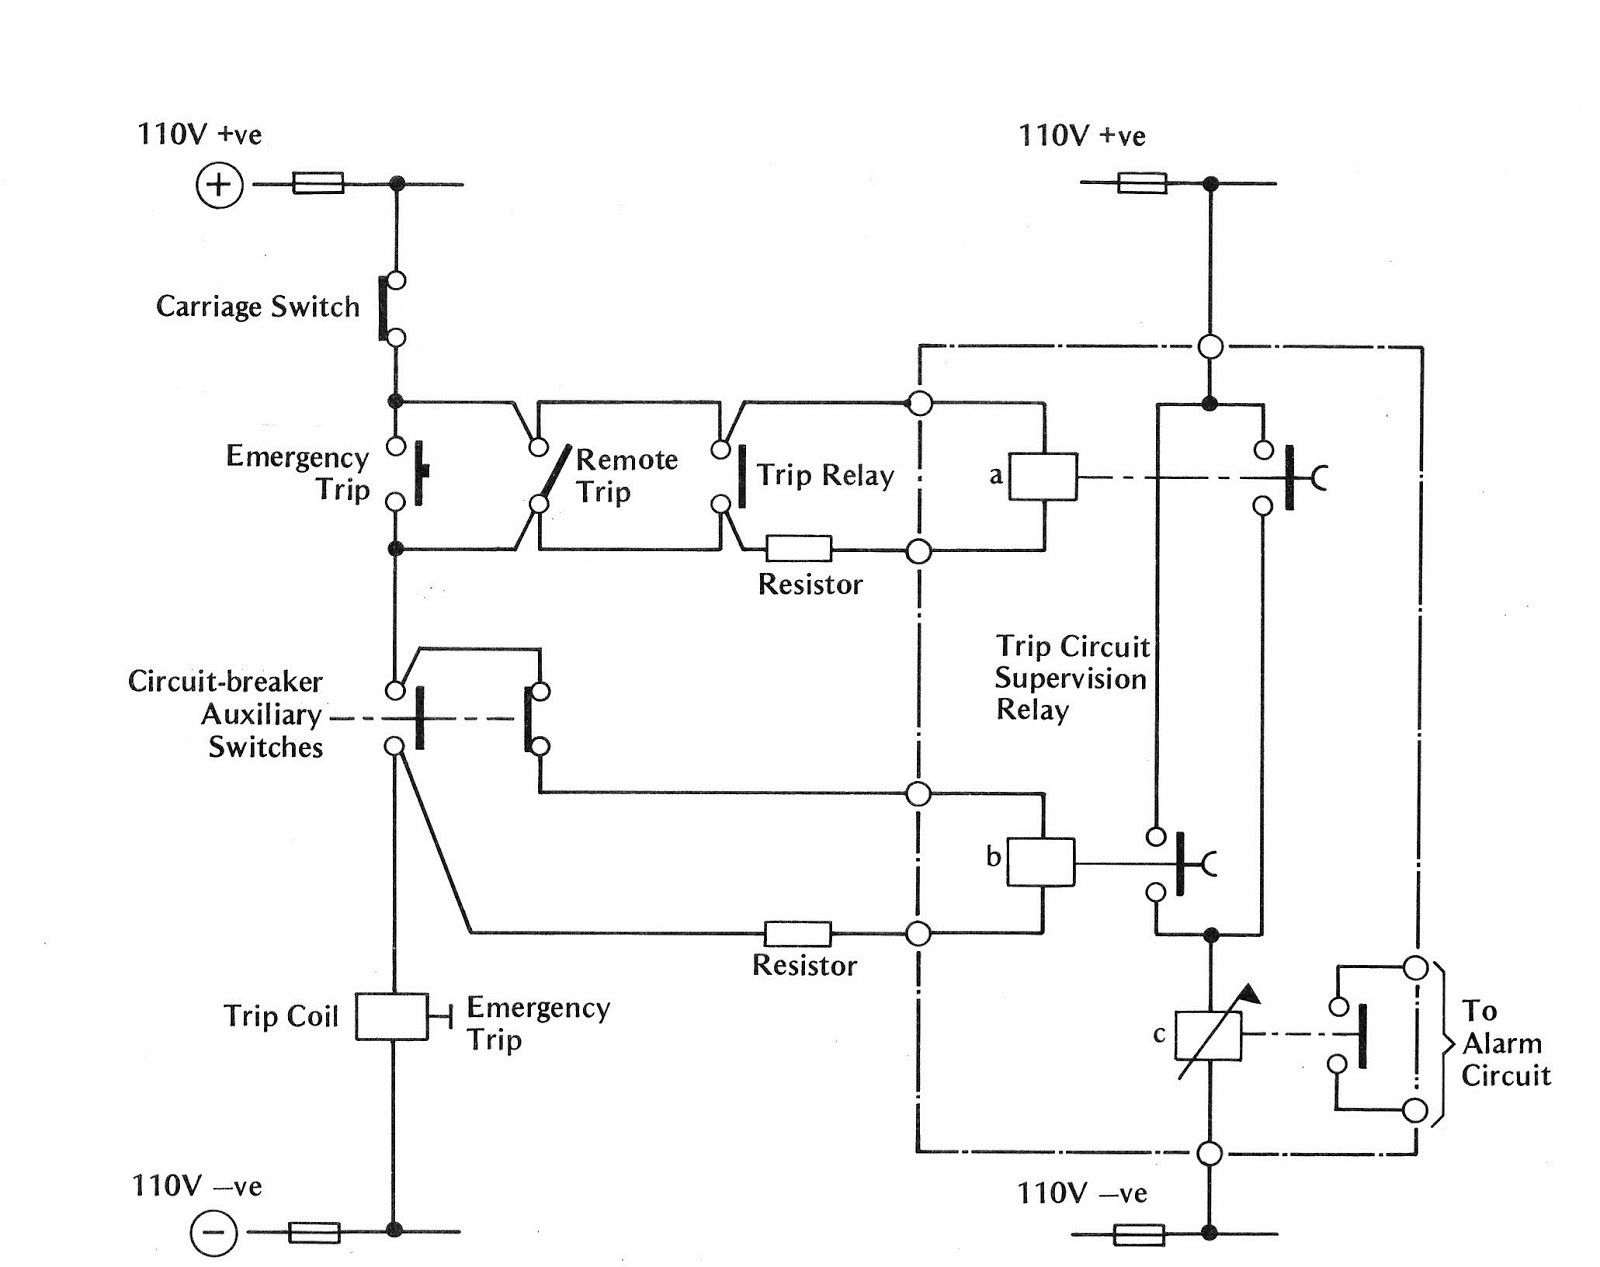 medium resolution of siemens breaker wiring diagram schema wiring diagramcircuit breaker shunt trip wiring diagram new siemens throughout siemens